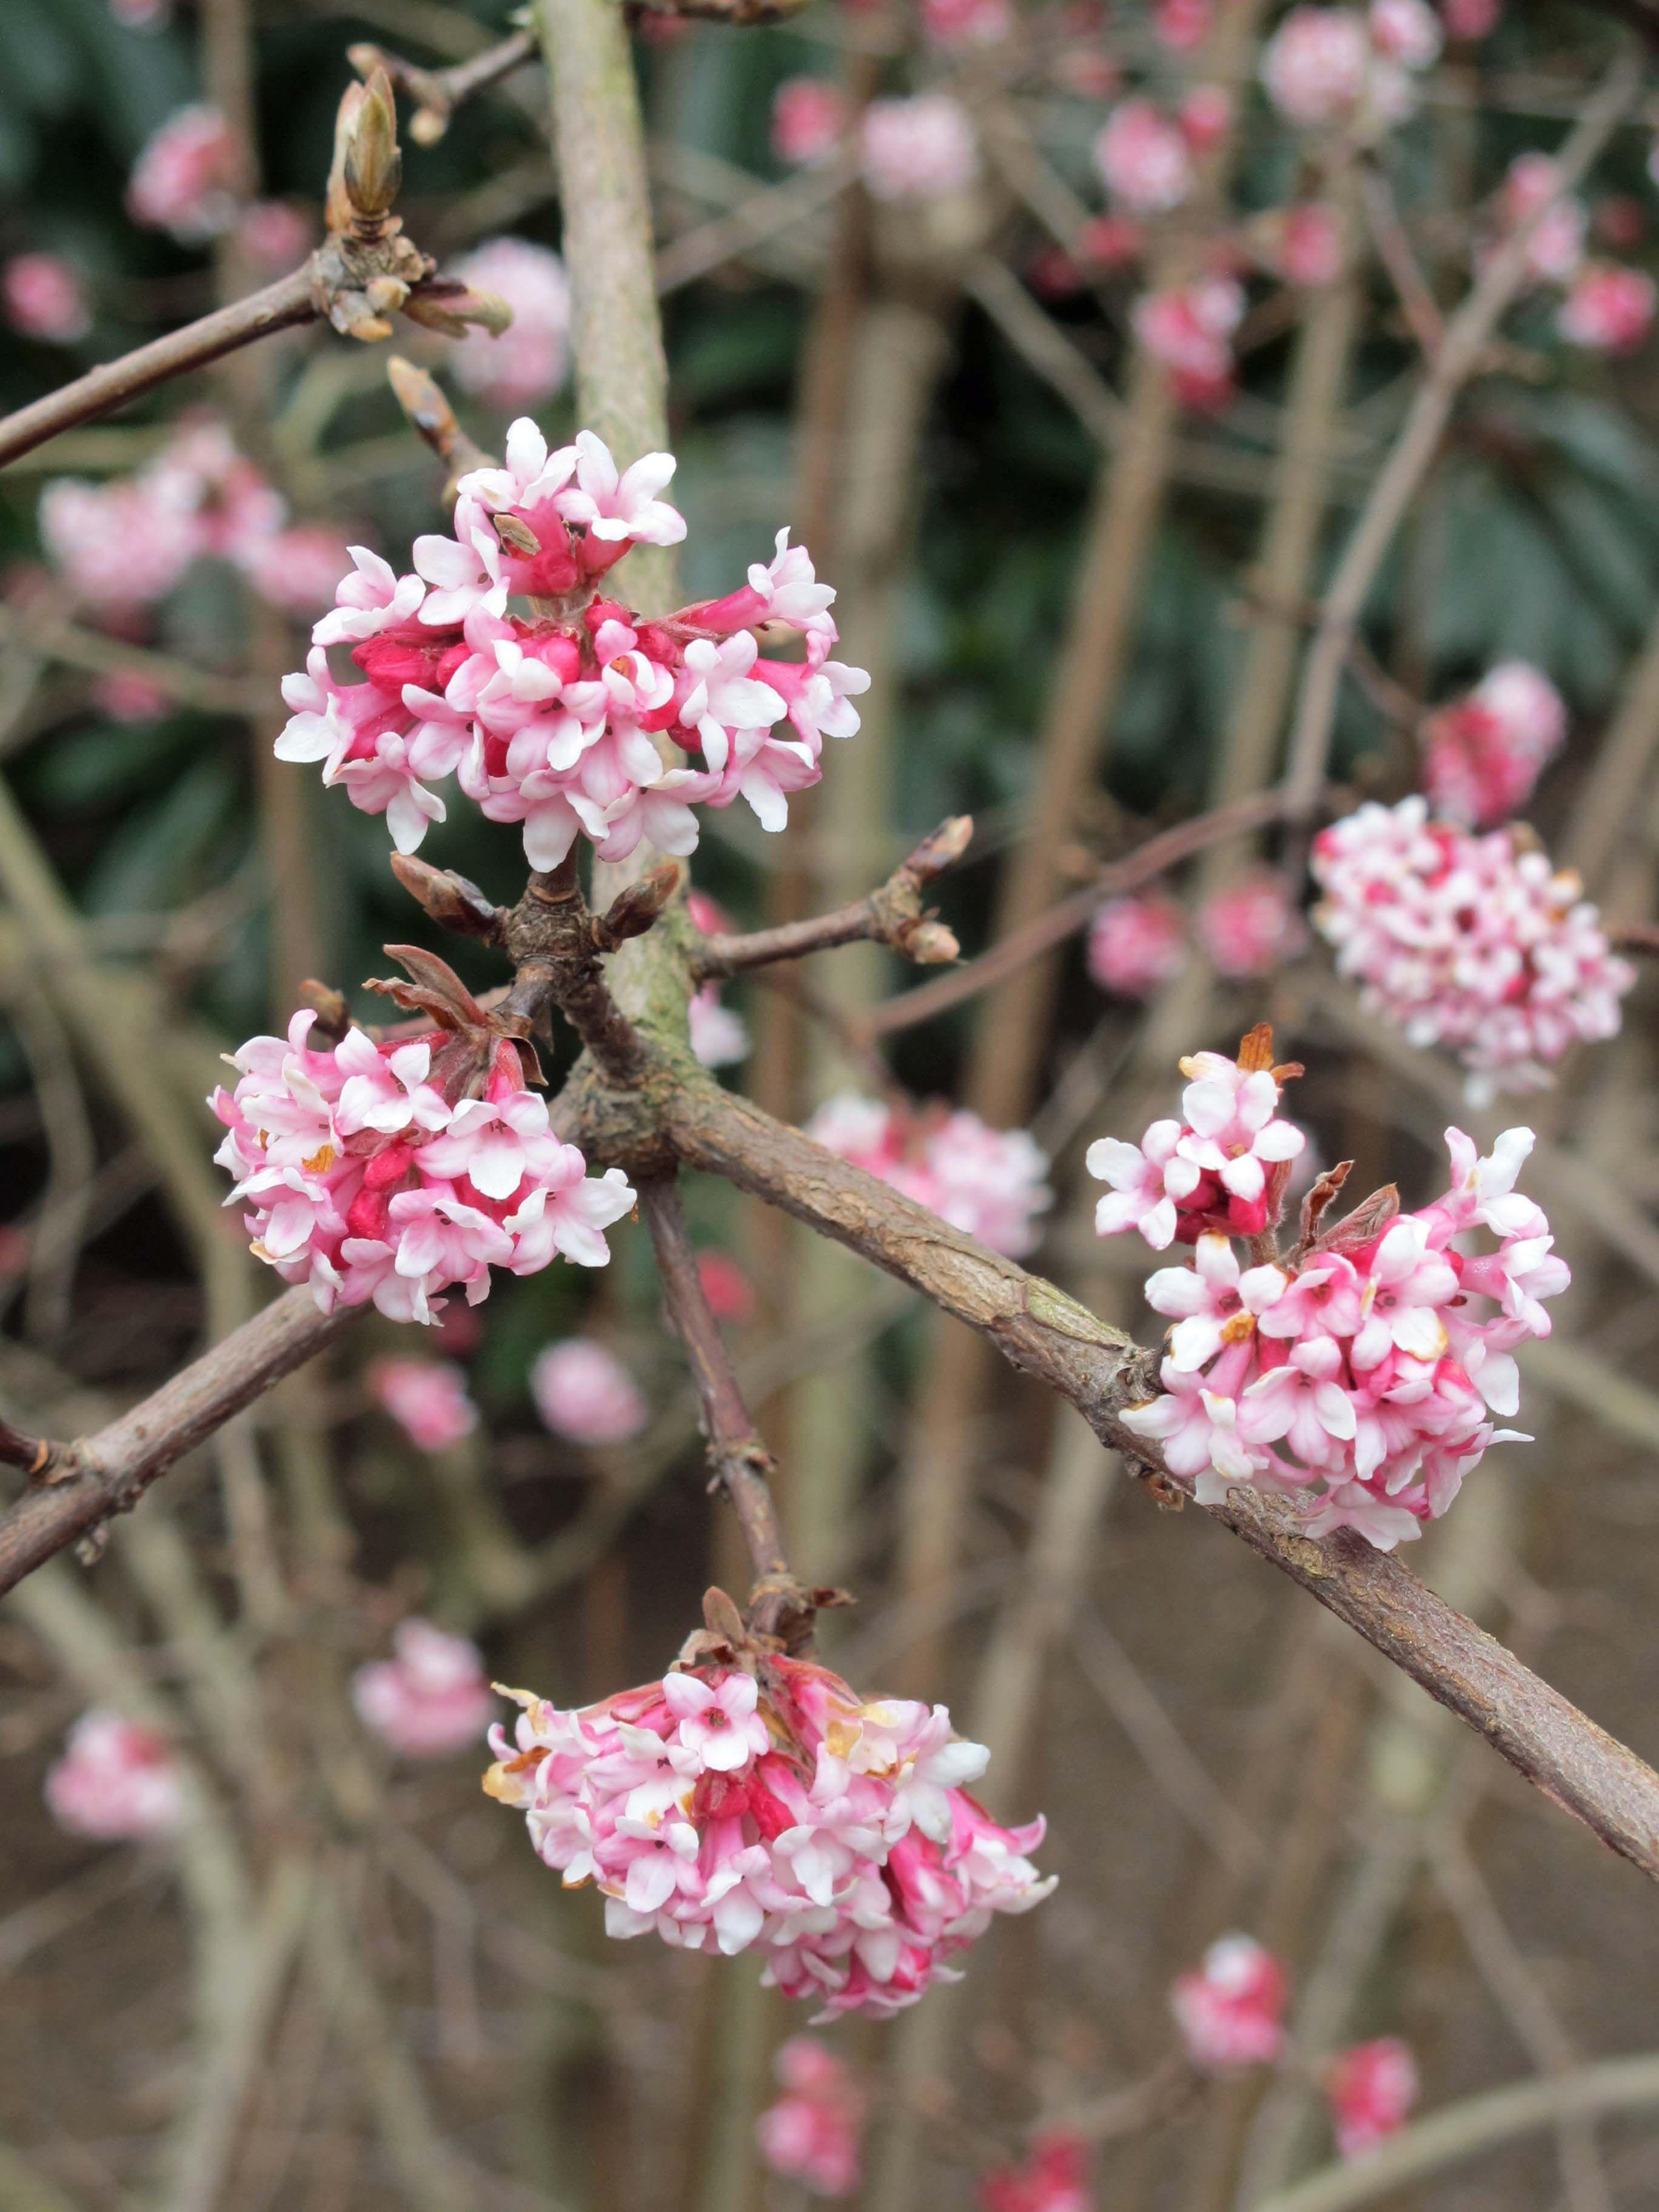 Late Winter Plants in glorious bloom! Winter plants